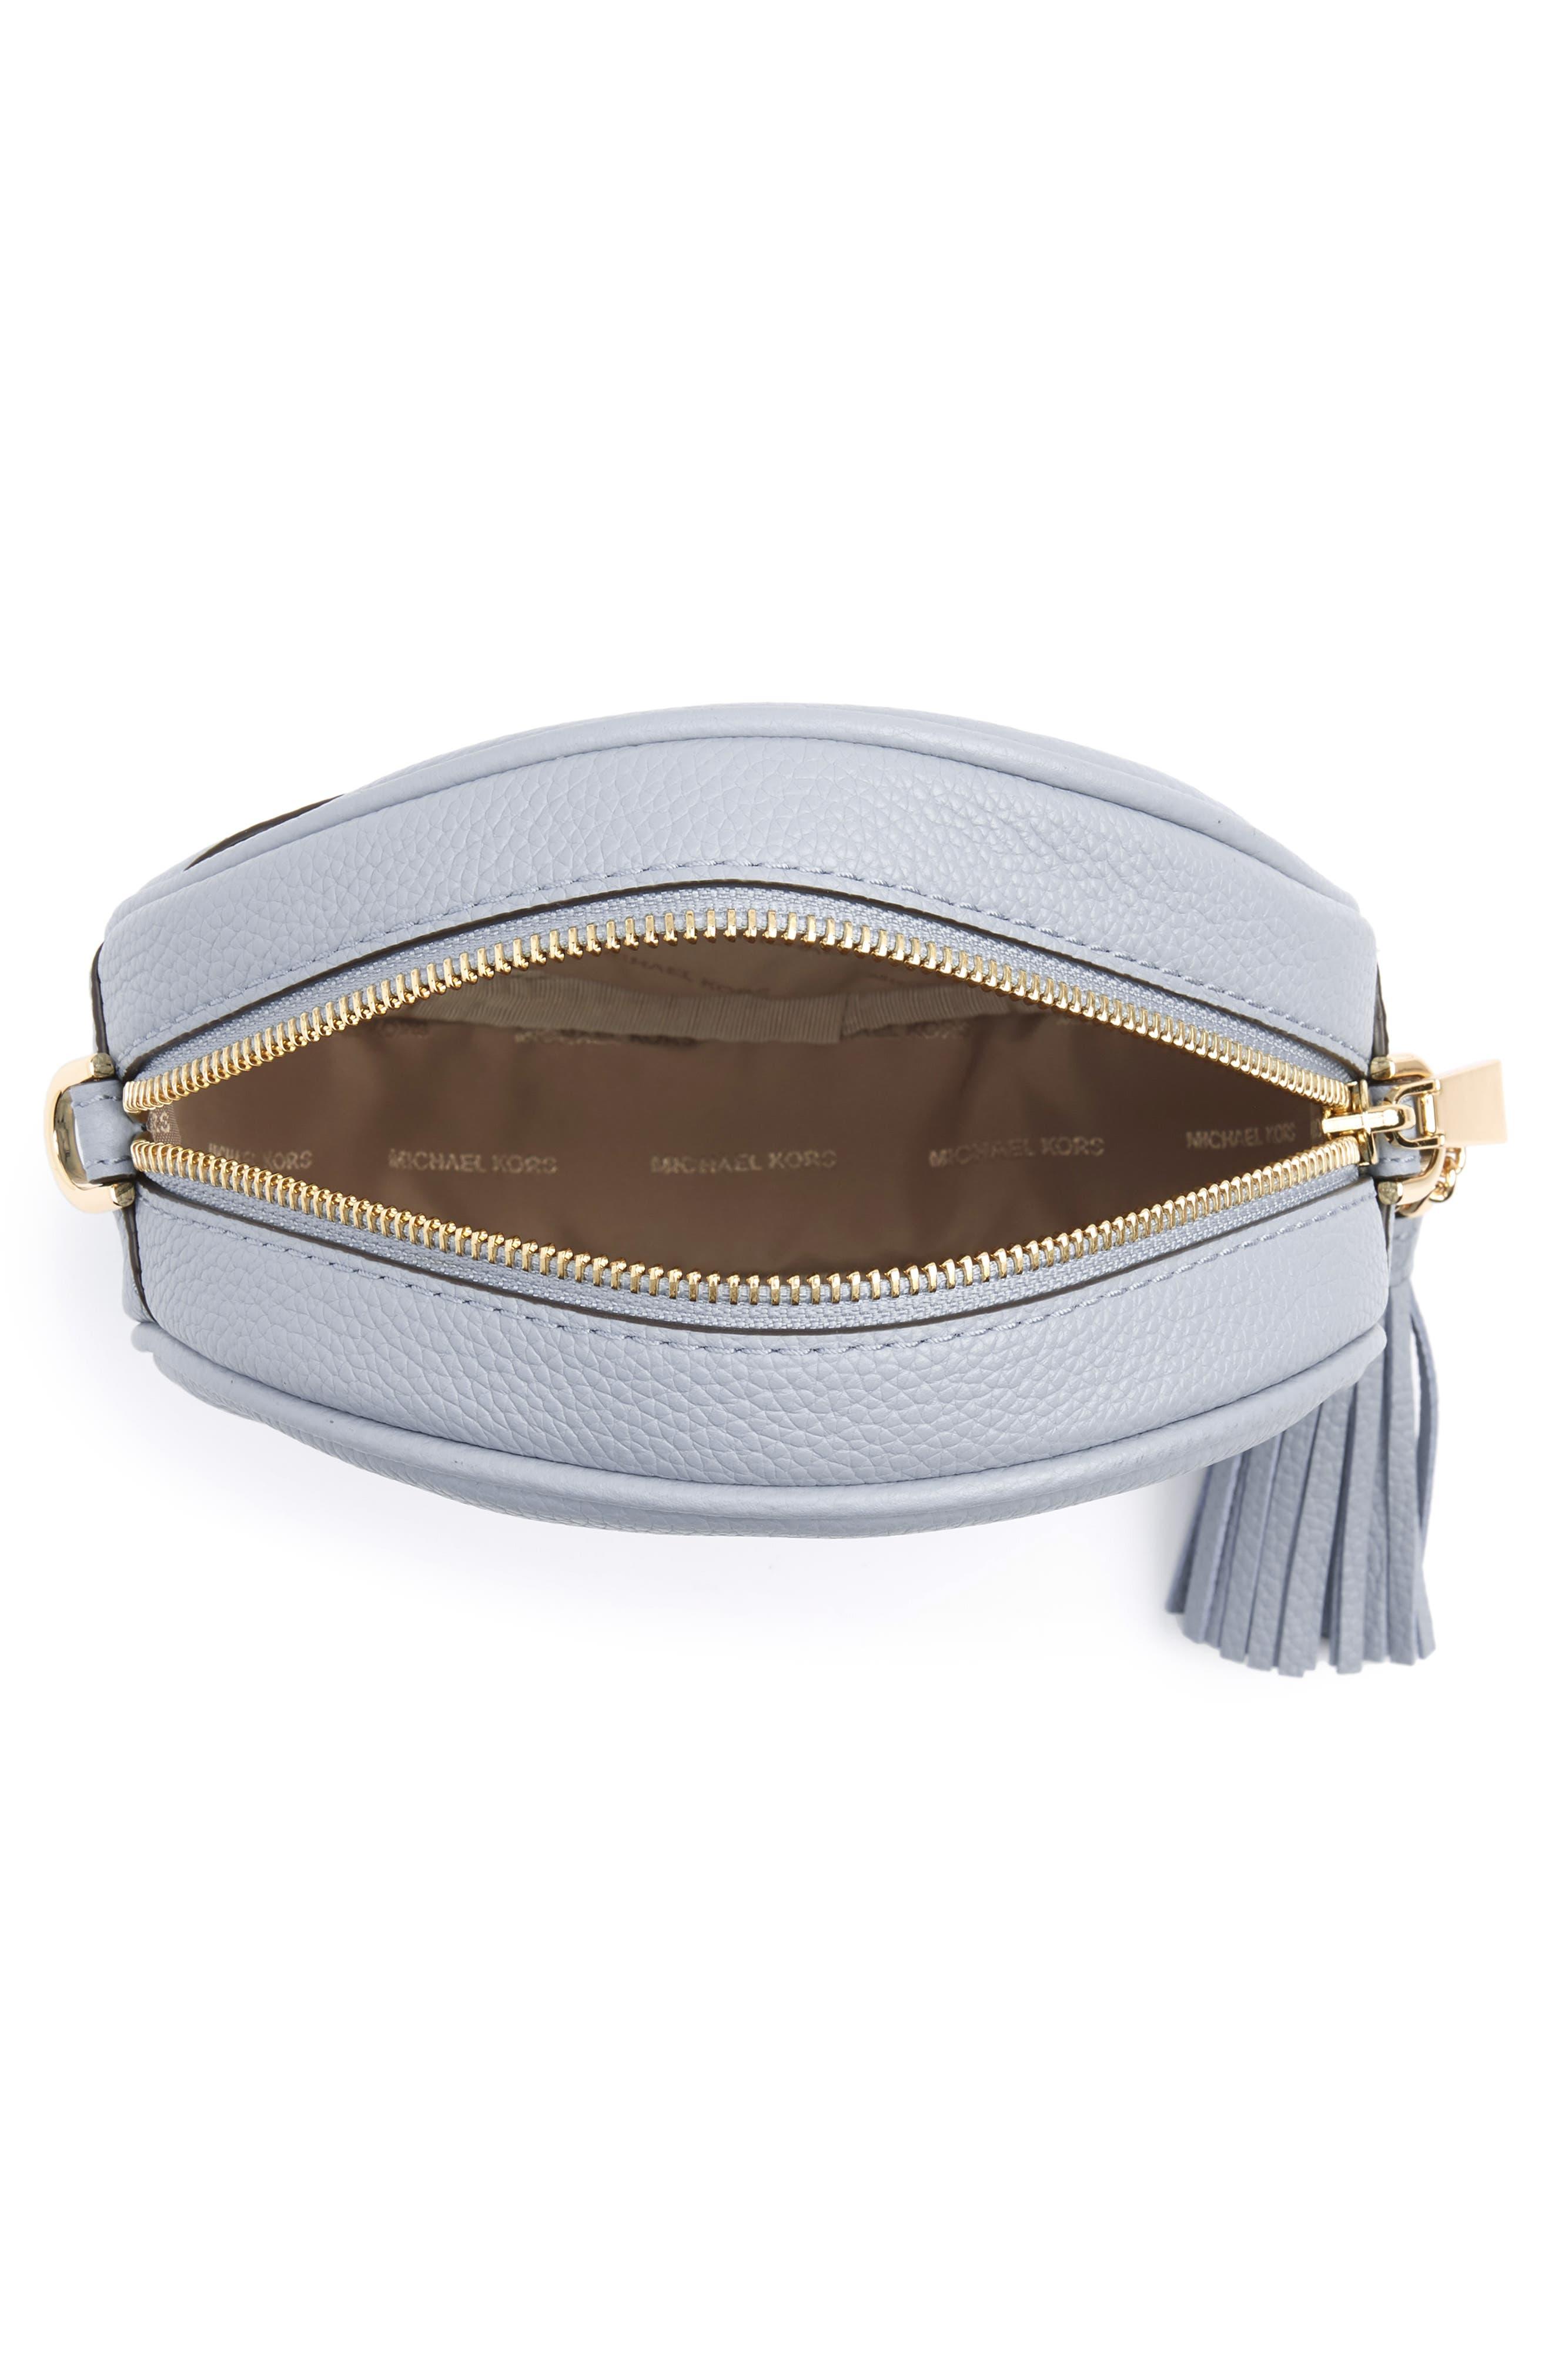 Medium Leather Canteen Bag,                             Alternate thumbnail 11, color,